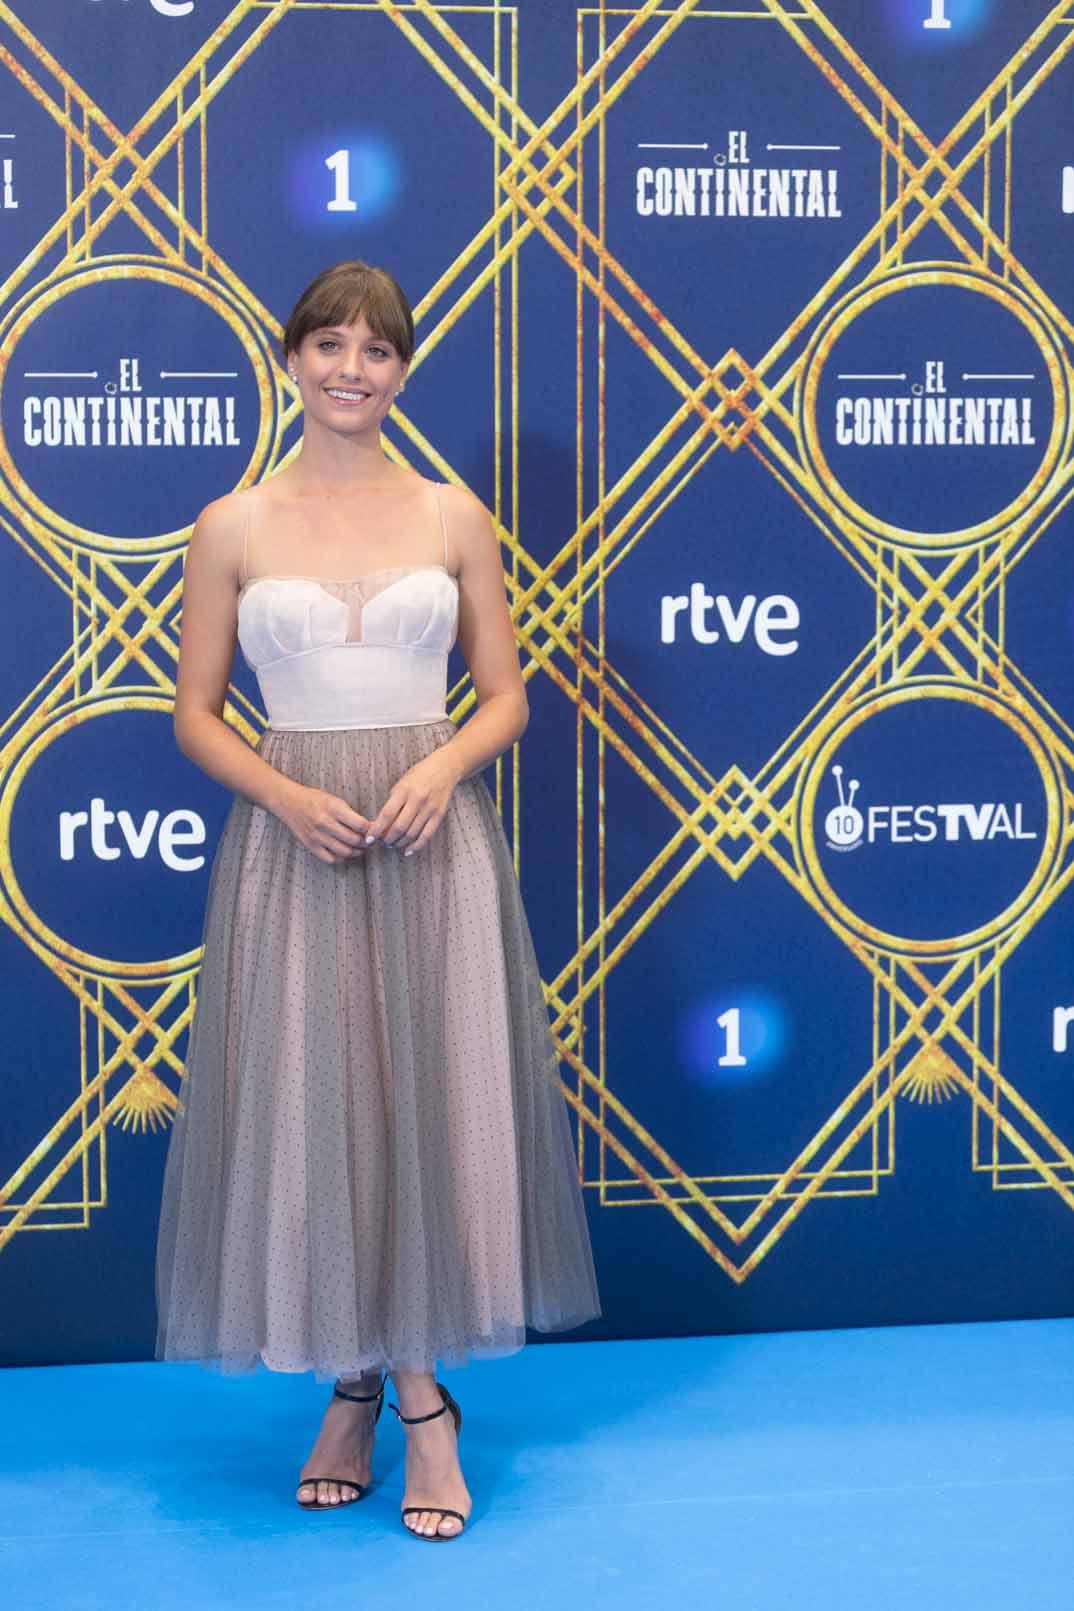 Michelle Jenner - El Continental © FesTVal